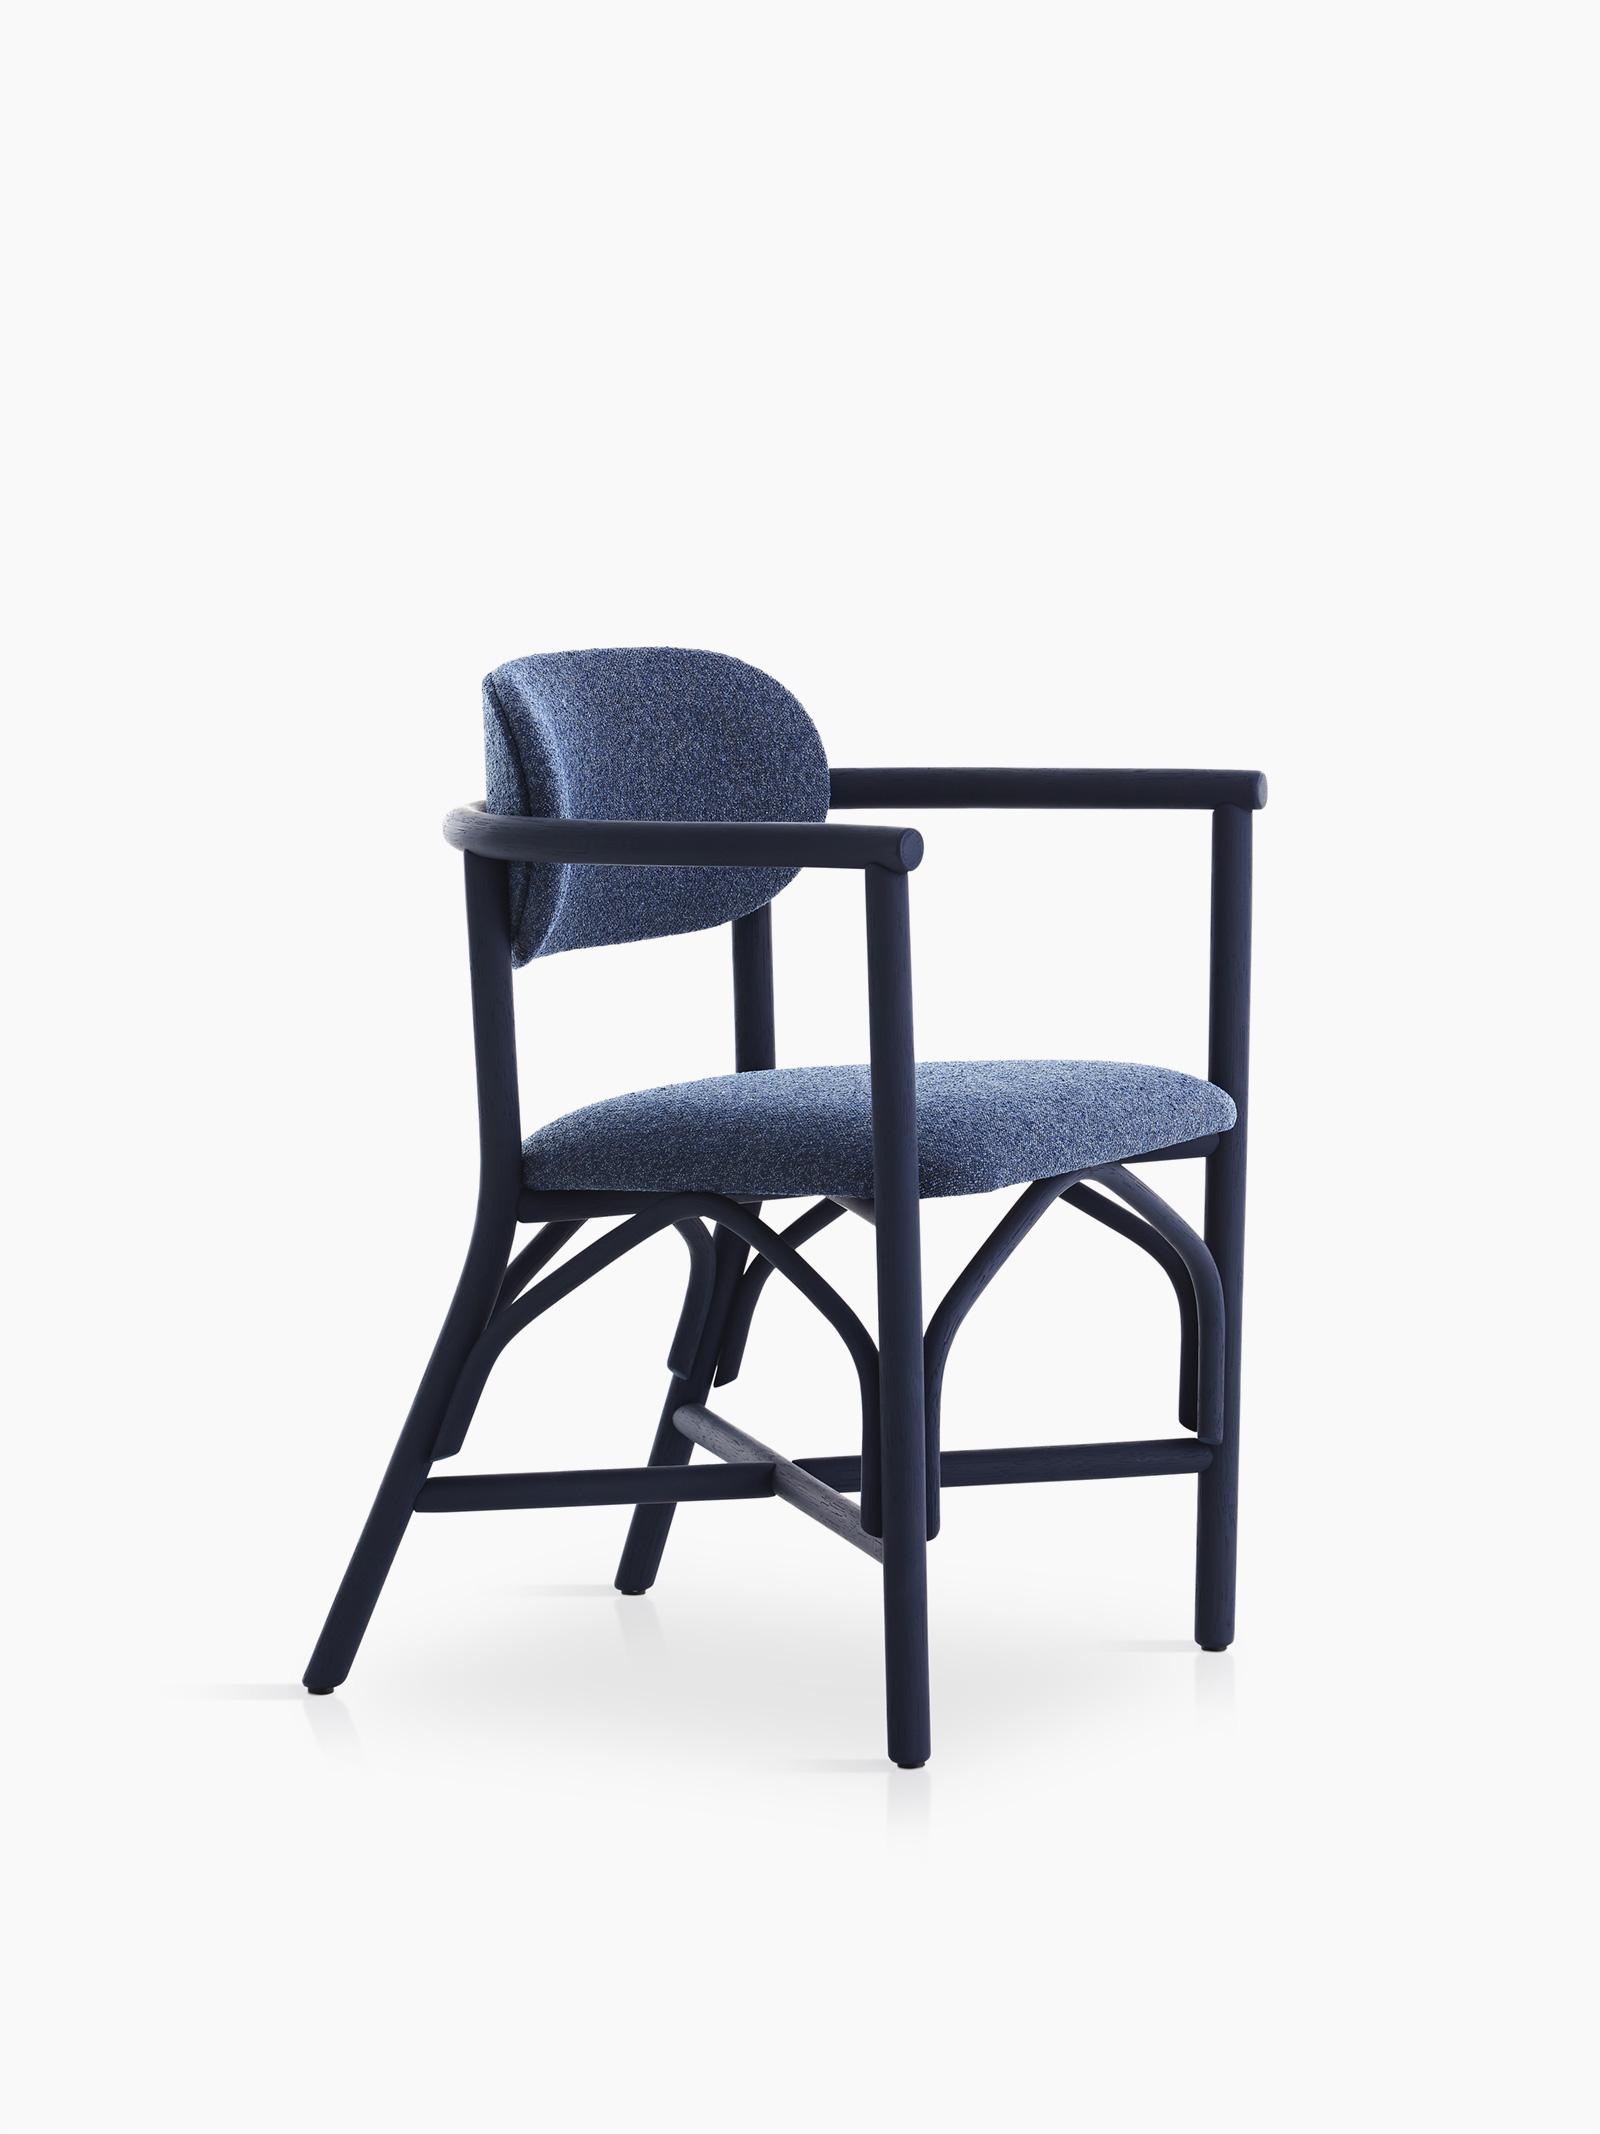 TinnappleMetz-Expormim-Altet-Upholstered-Dining-Armchair-02